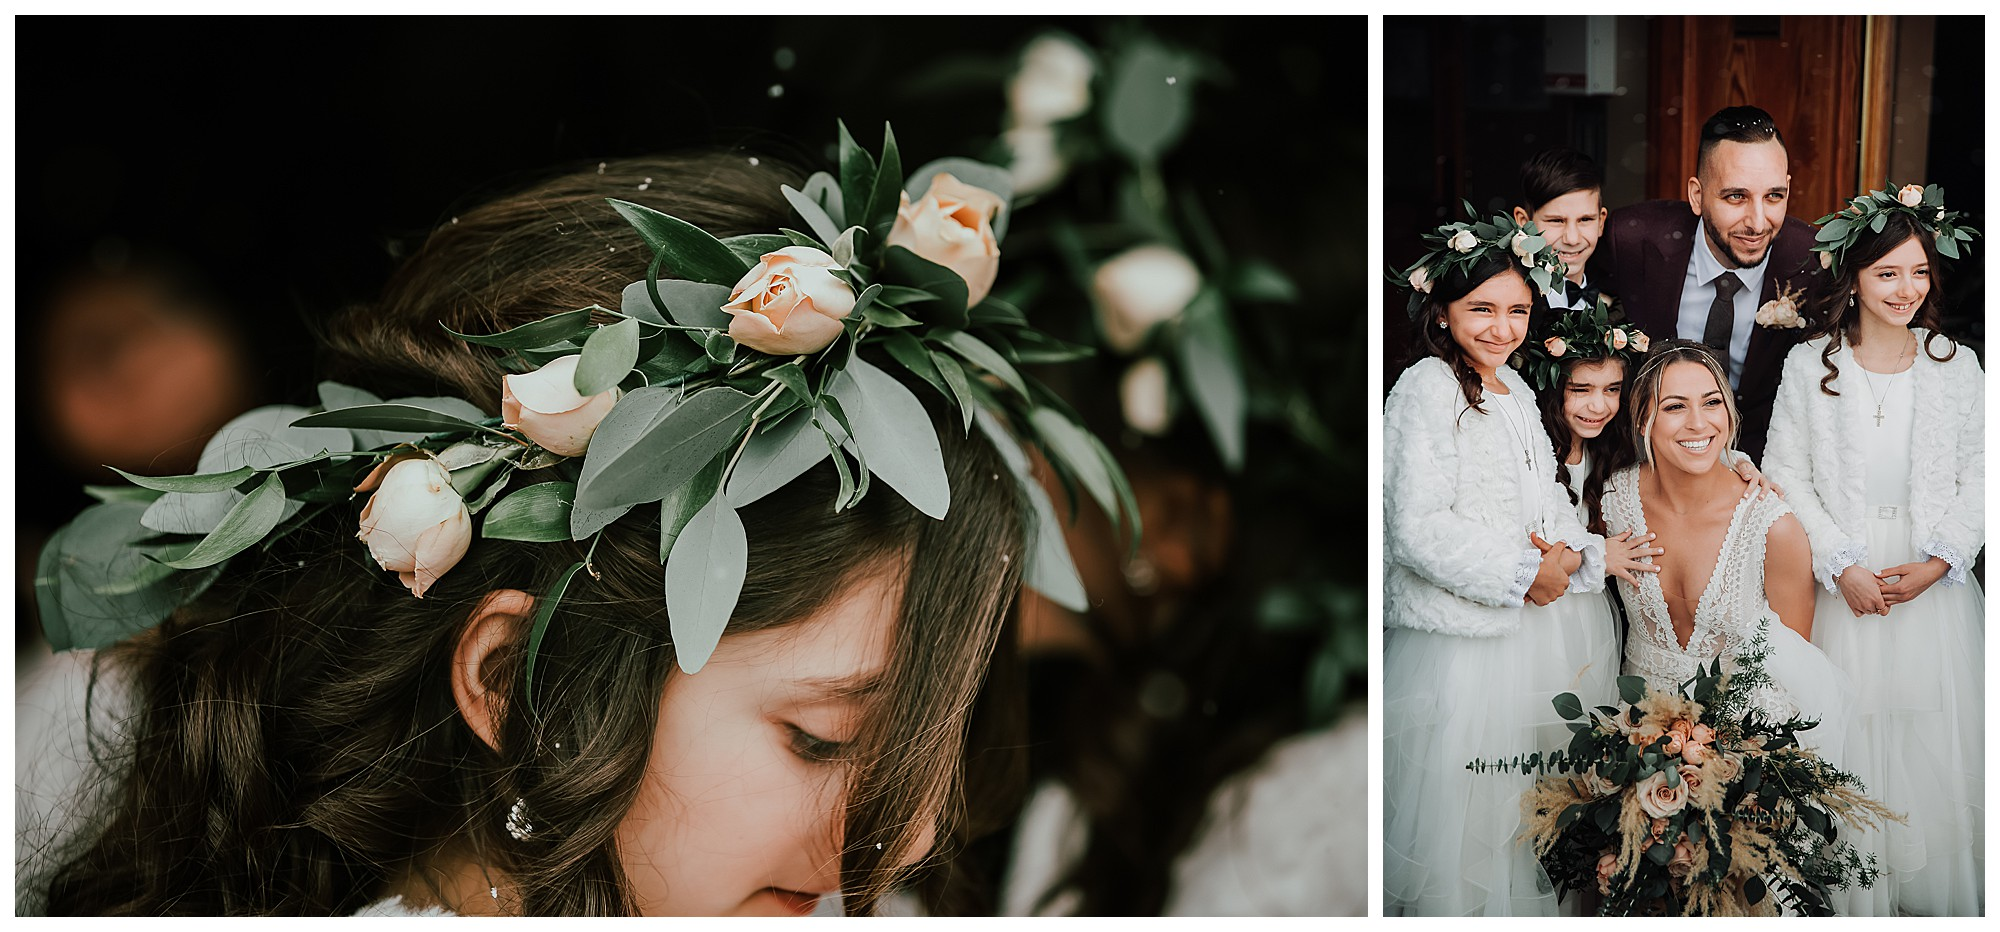 Joanna-Christos-Grand-Luxe-Wedding-Photos-Mint-Room-Toronto-VanDaele-Russell_0078.jpg